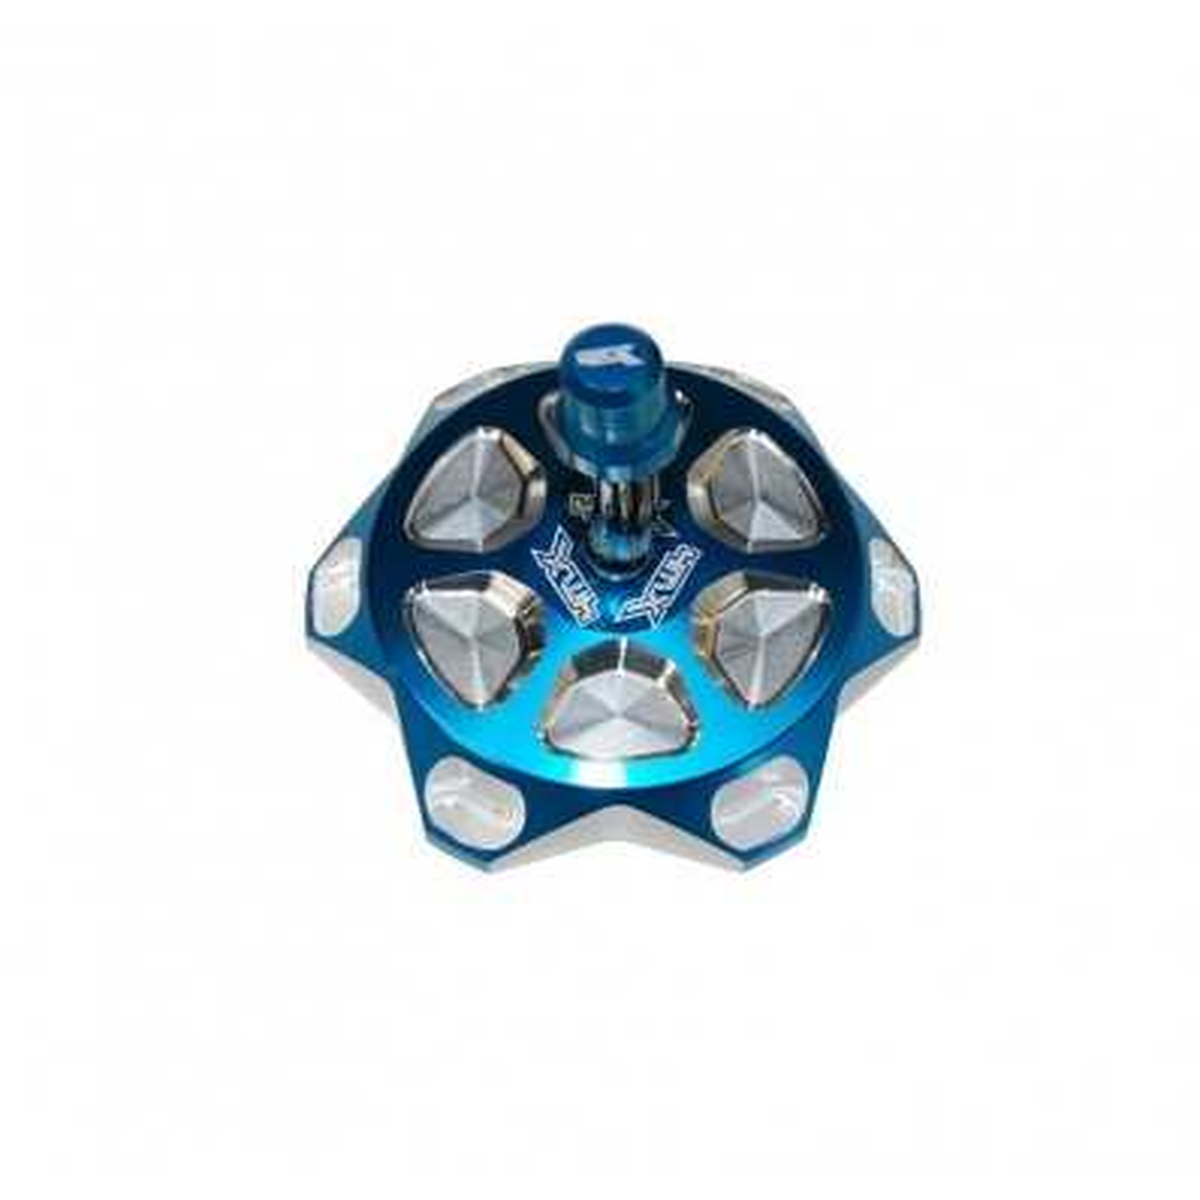 01TAPGC106-AZ - Tapon Deposito Yz-Yzf Kx-Kxf... Azul